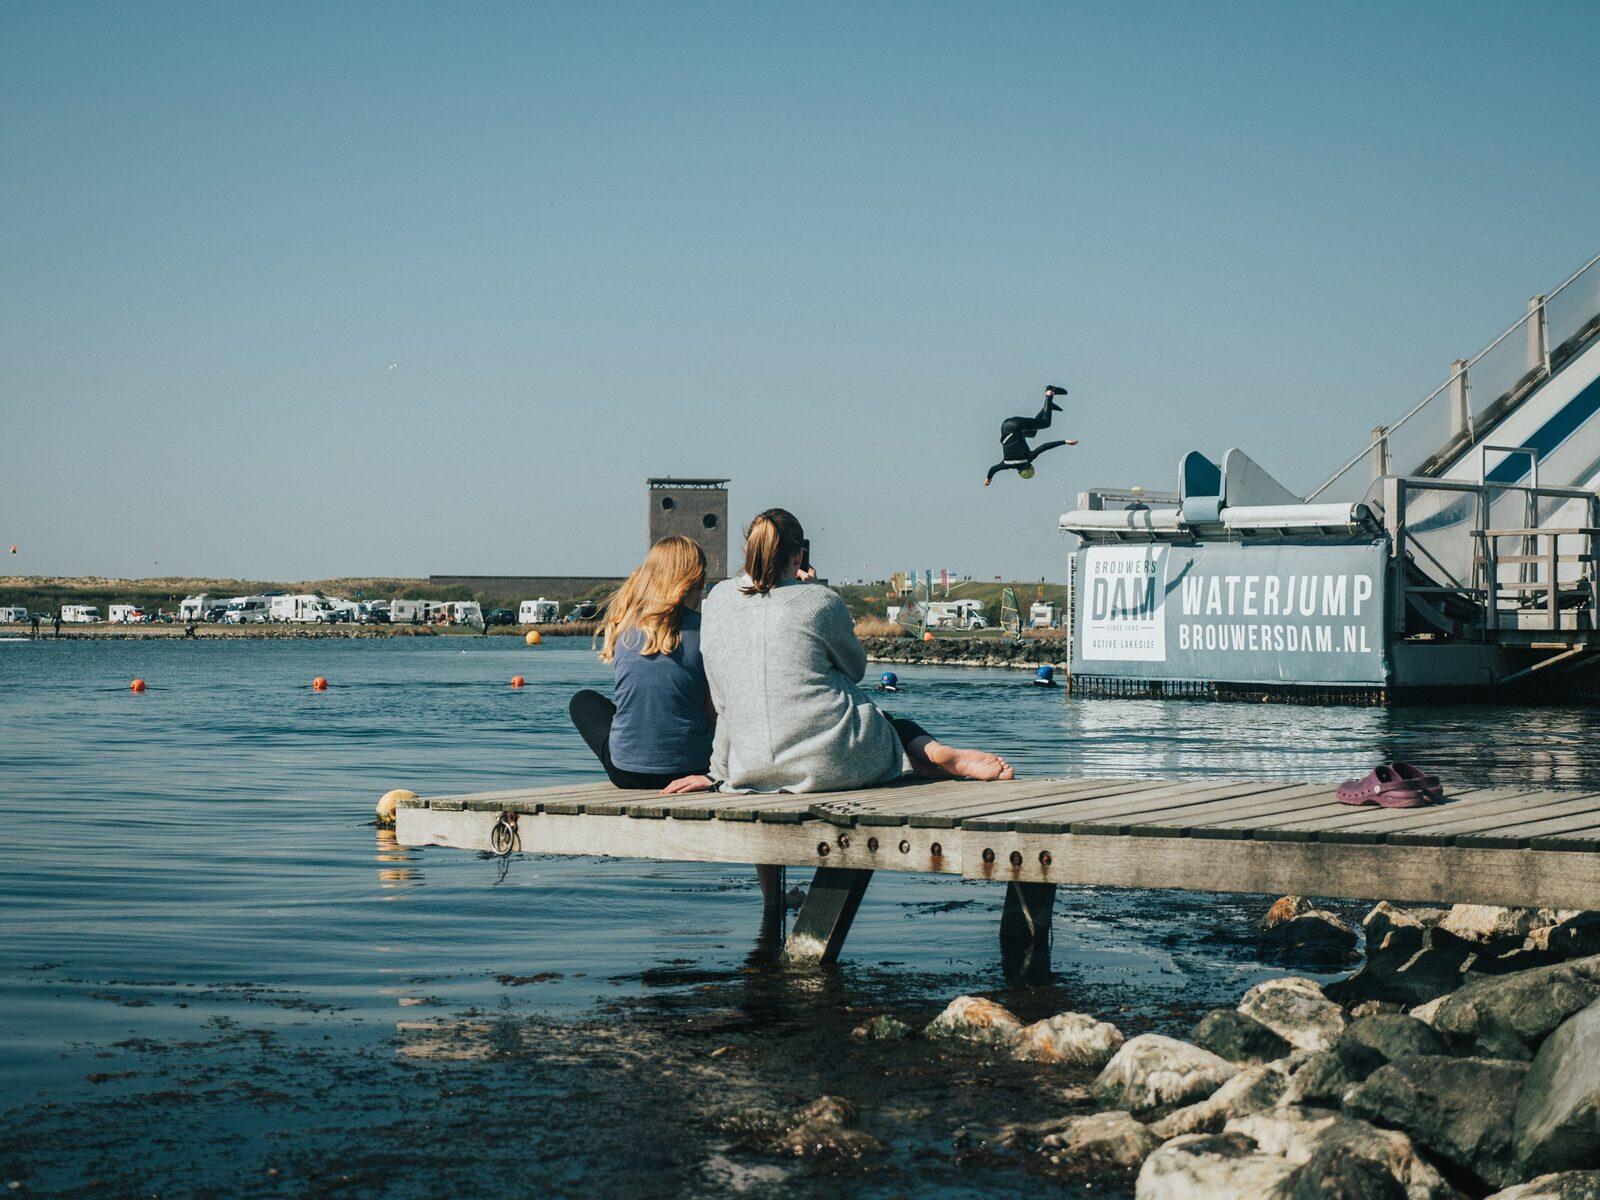 Waterjump Brouwerdam